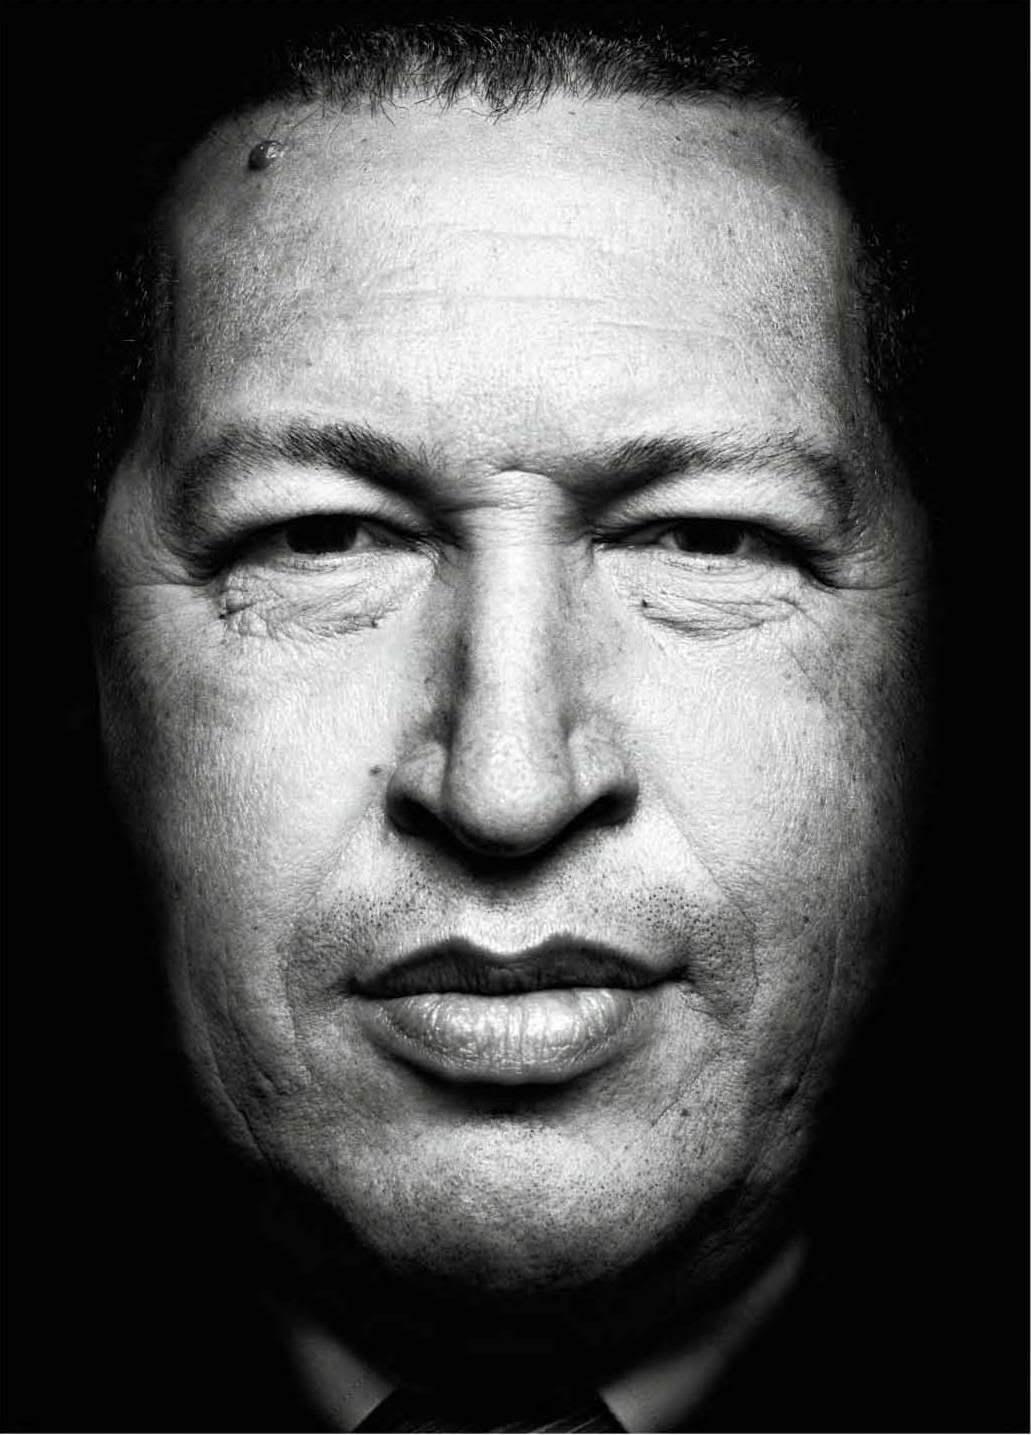 <b>Hugo Rafael</b> Chávez Frías, 1954 - 2013 - hugo_chavez